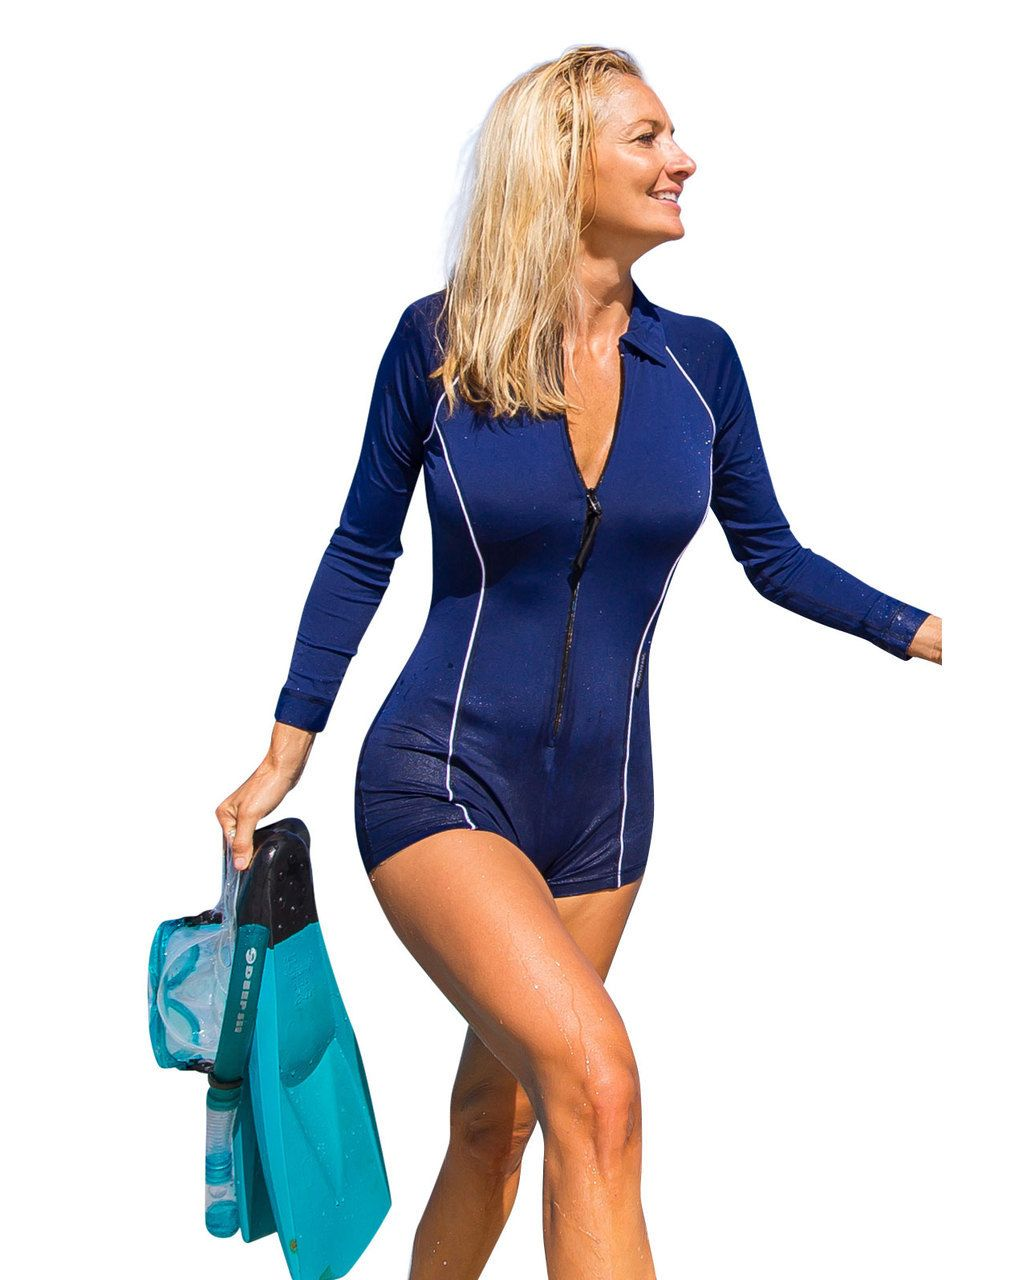 120be2e4ed Solartex Sun Gear - Lady s Boyleg Swimsuit - Long Sleeves - by Stingray